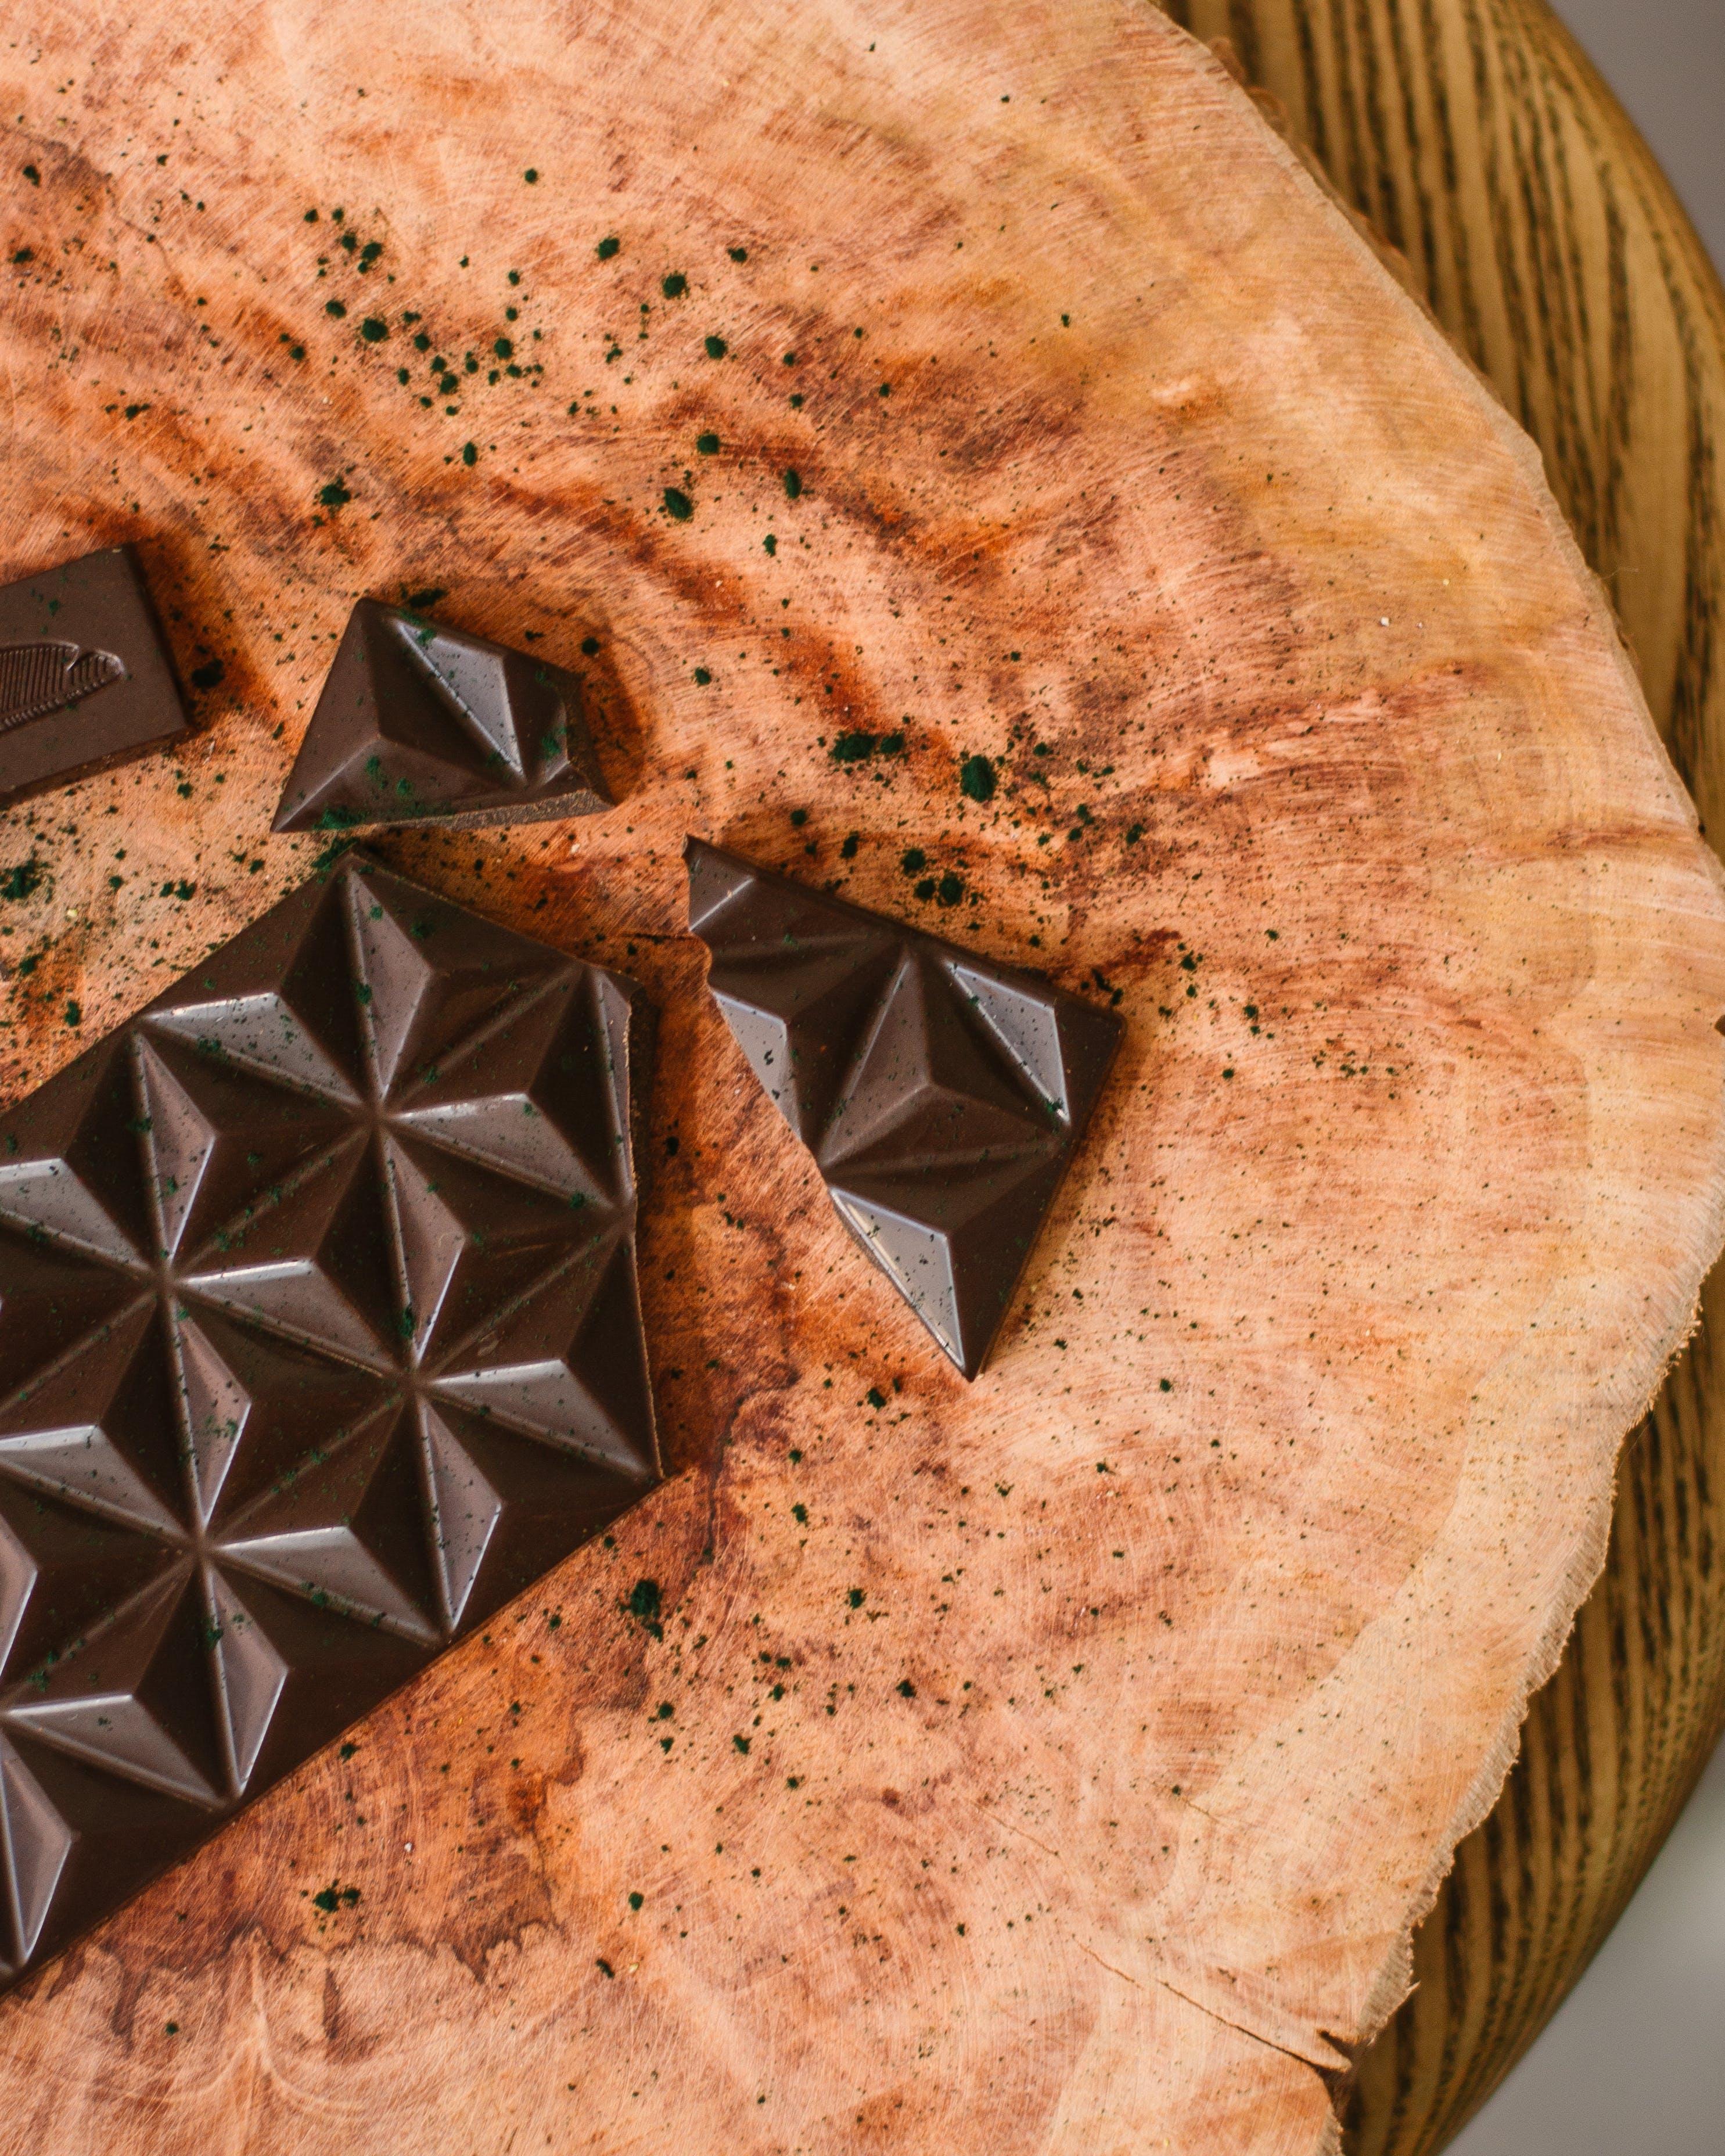 ahşap, çikolata, doku, Gıda içeren Ücretsiz stok fotoğraf